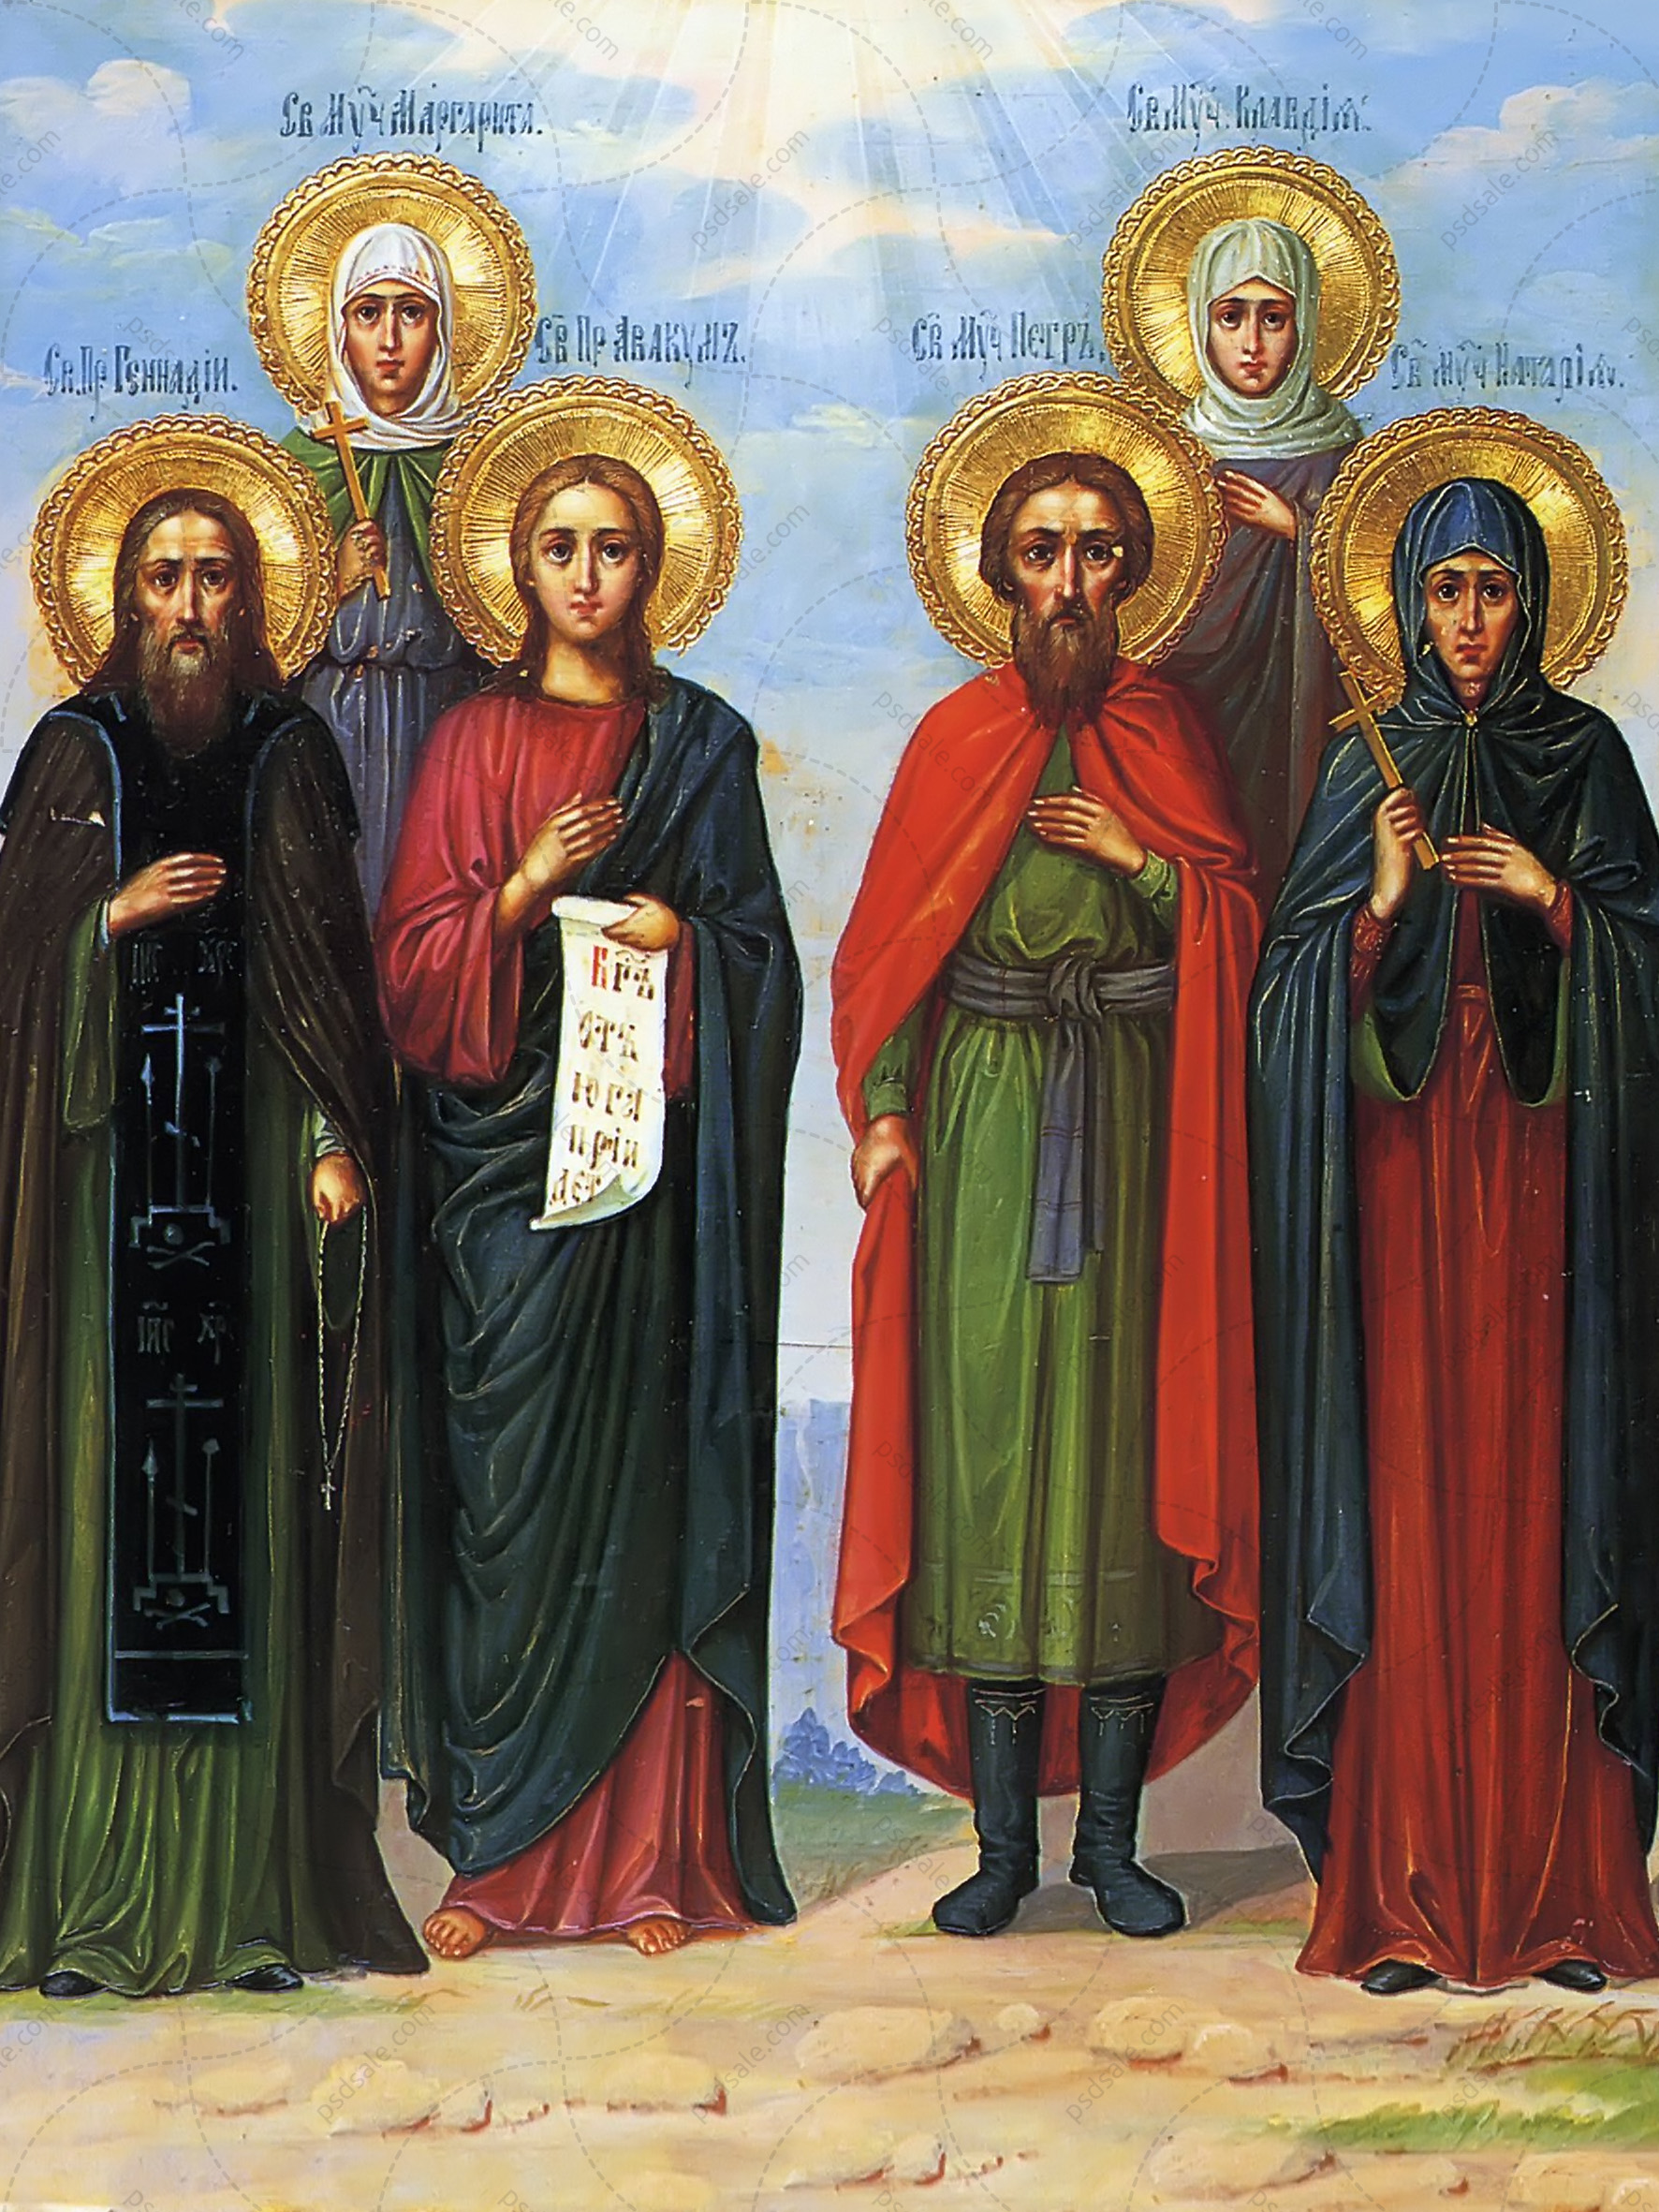 Геннадий, Маргарита, Петр, Клавдия, Наталия